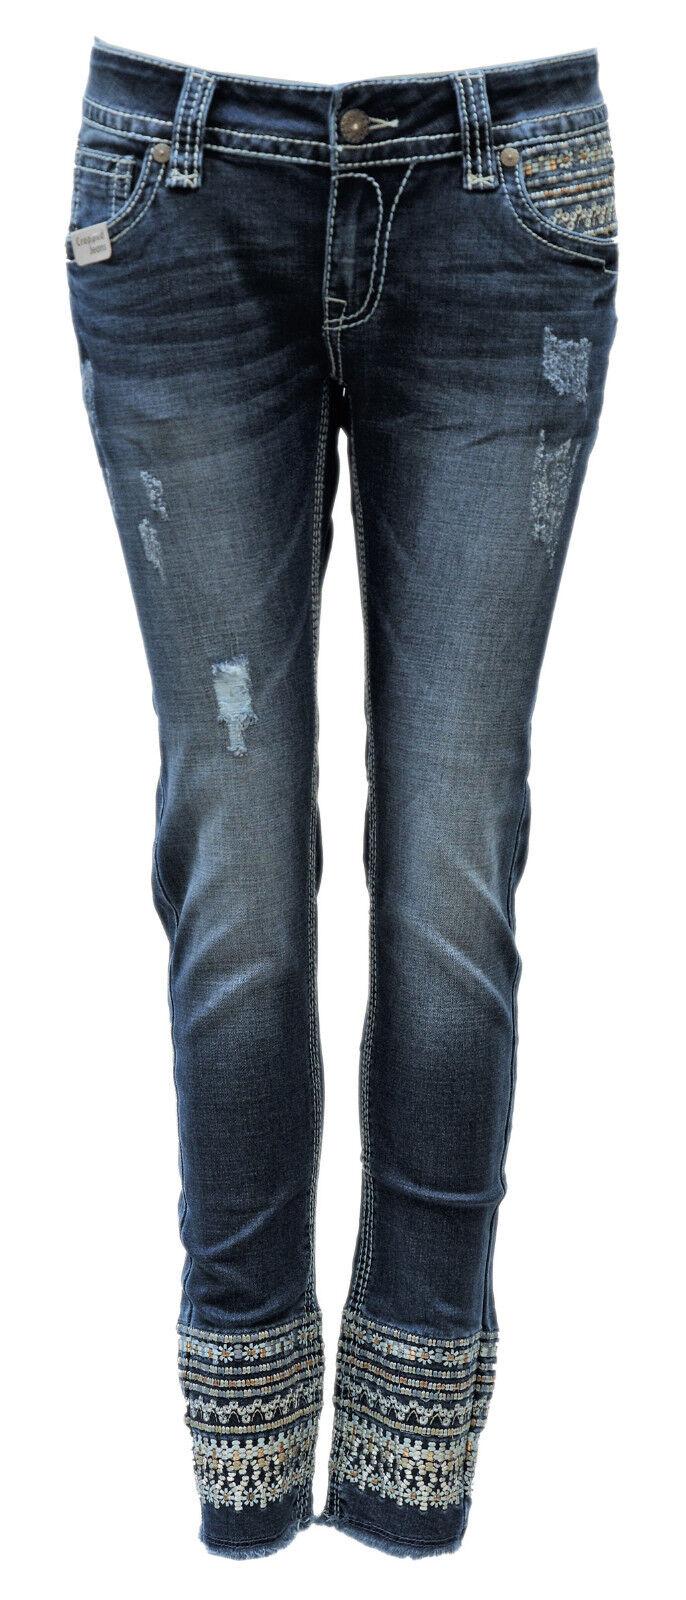 Blau Monkey Jeans Damen Luna Cropped Cropped Cropped BM-3988 Luxery b3b019